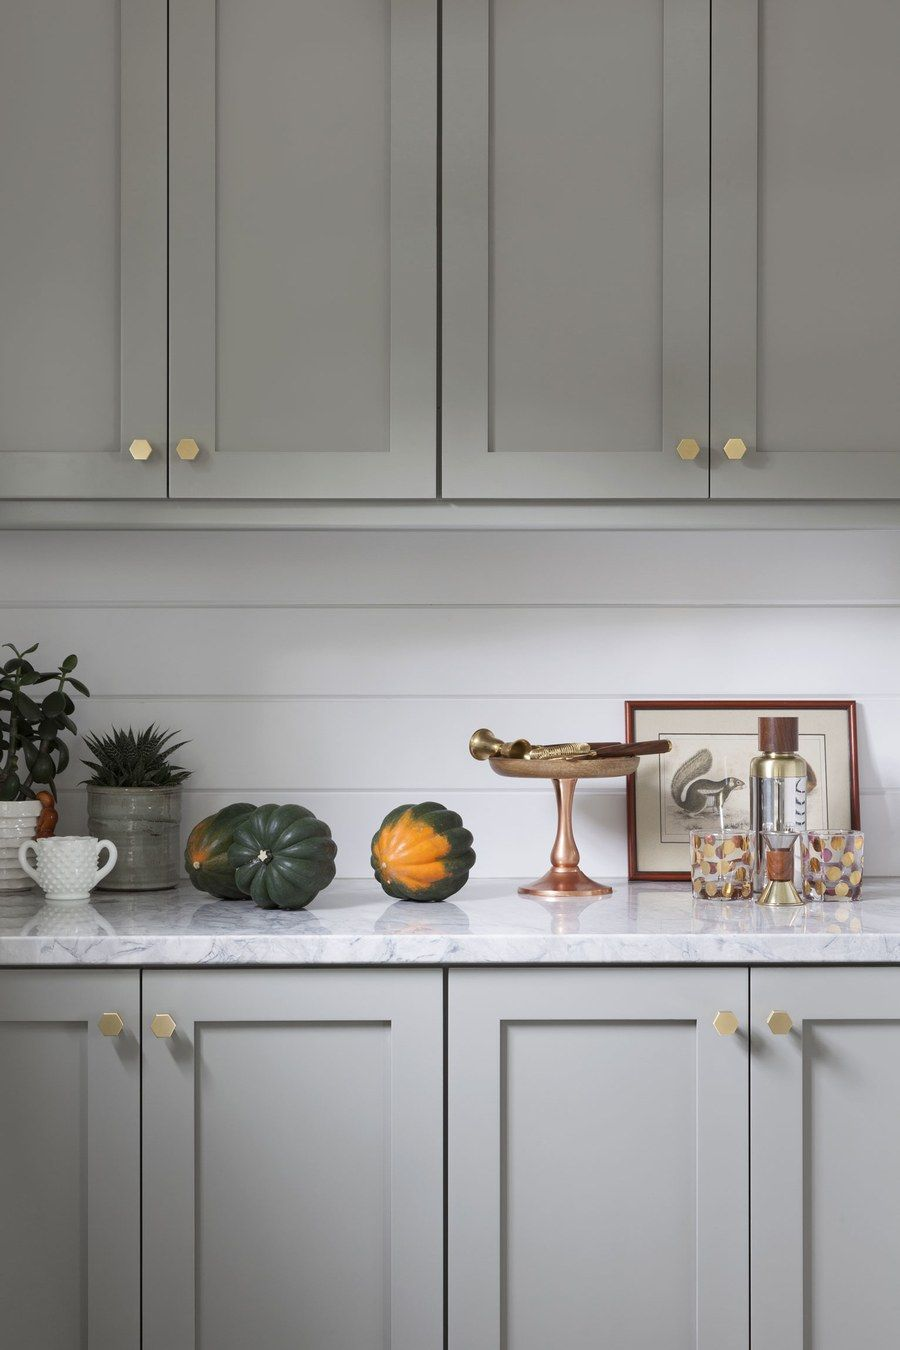 5 Beautiful Kitchen Backsplash Ideas—That Aren't Tile